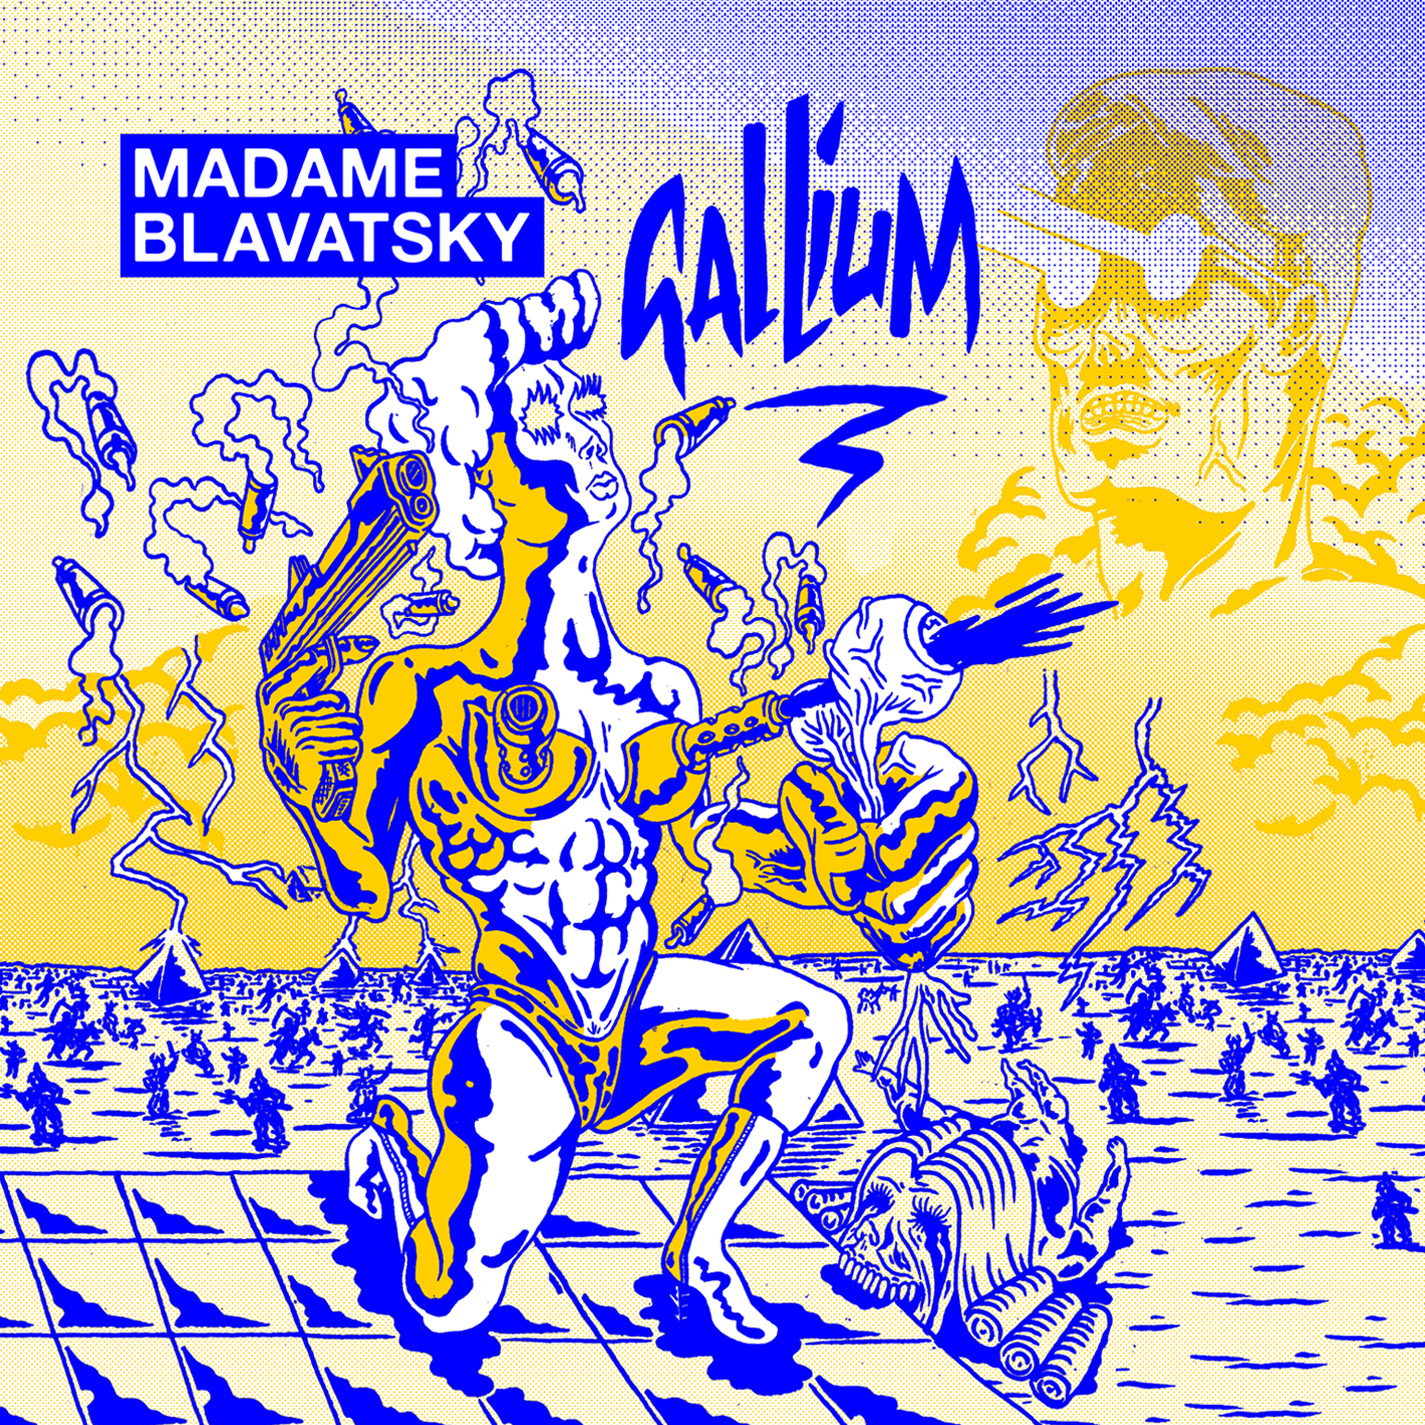 Madame Blavatsky – Gallium